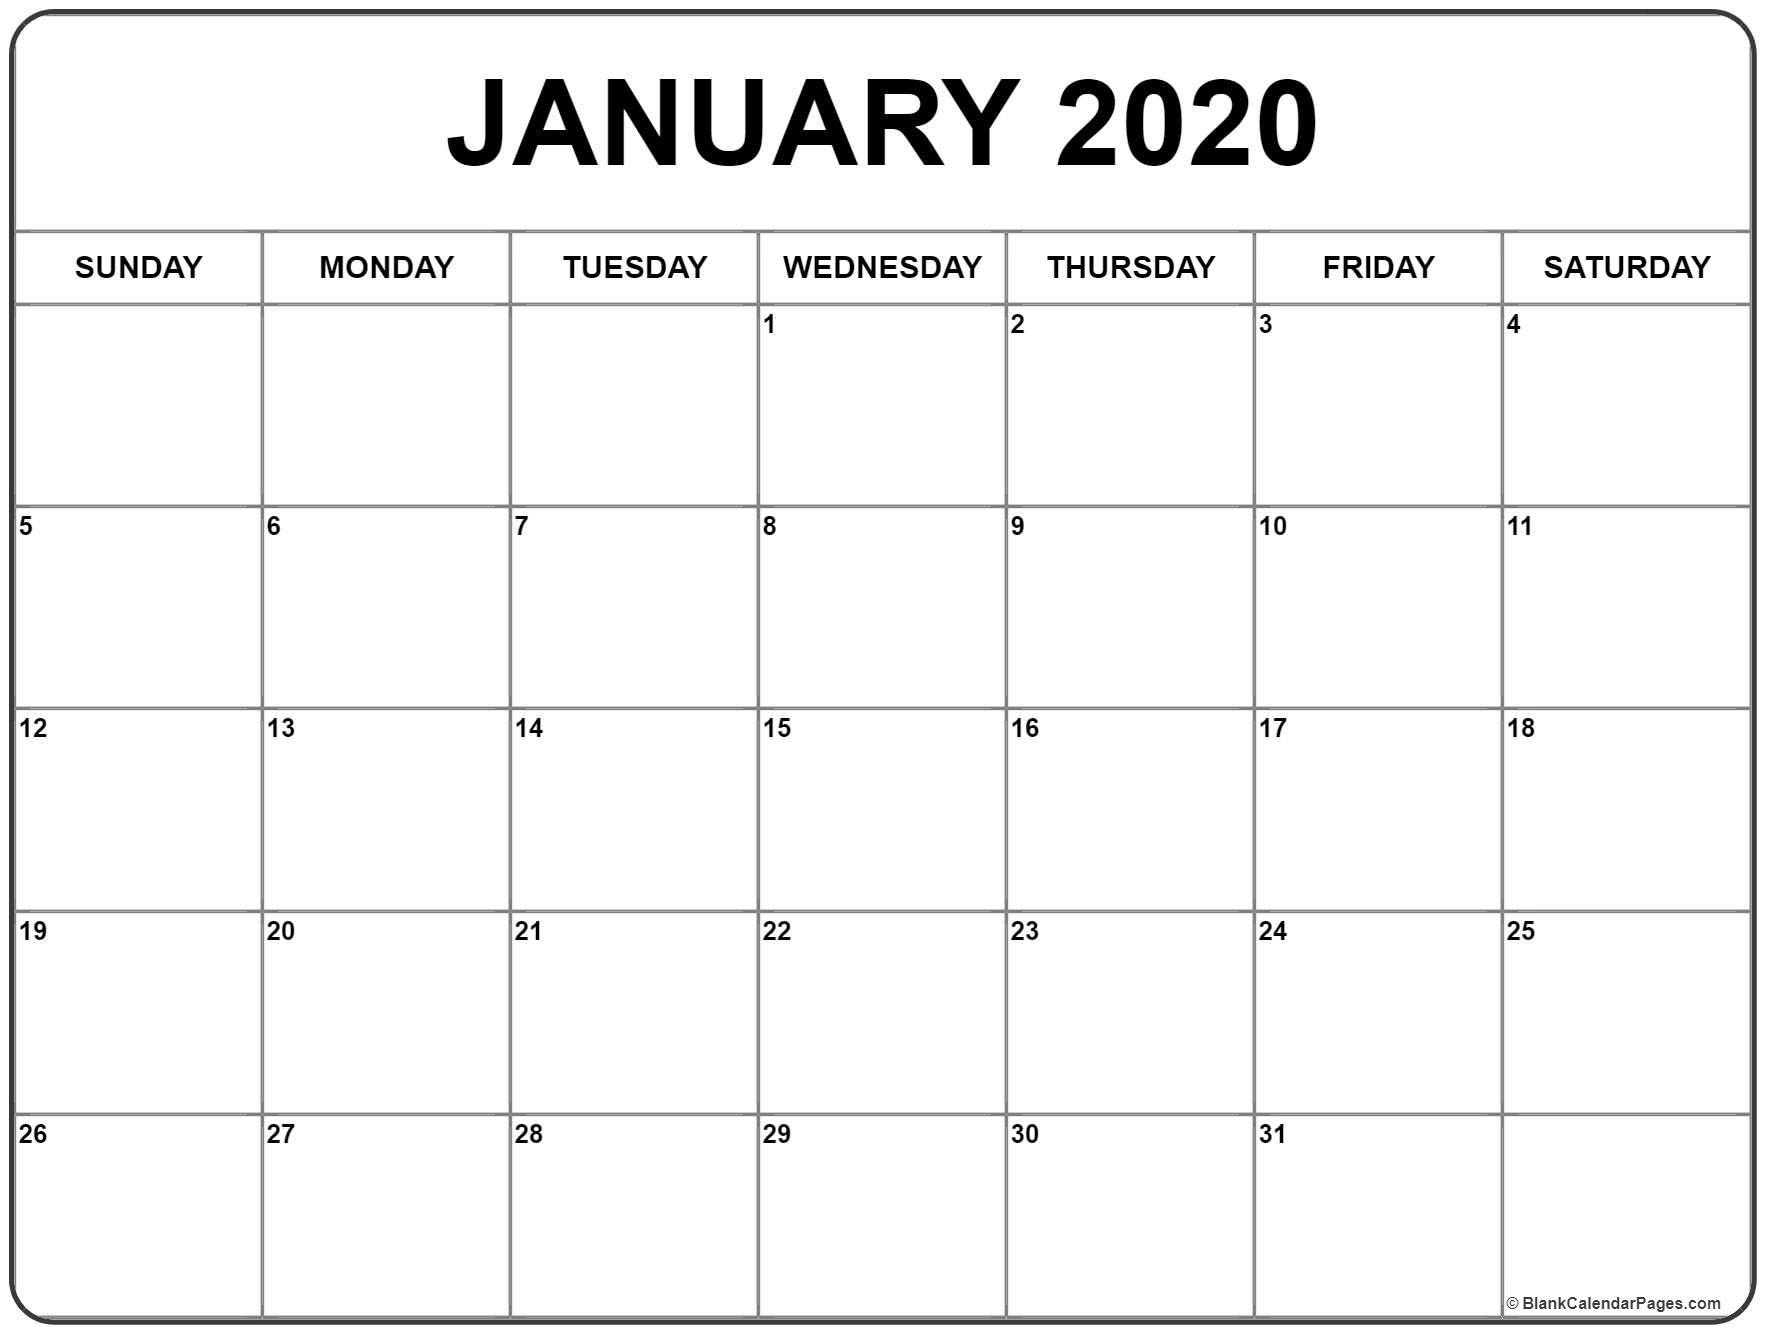 January 2020 Calendar | Free Printable Monthly Calendars-January 2020 Calendar Imom